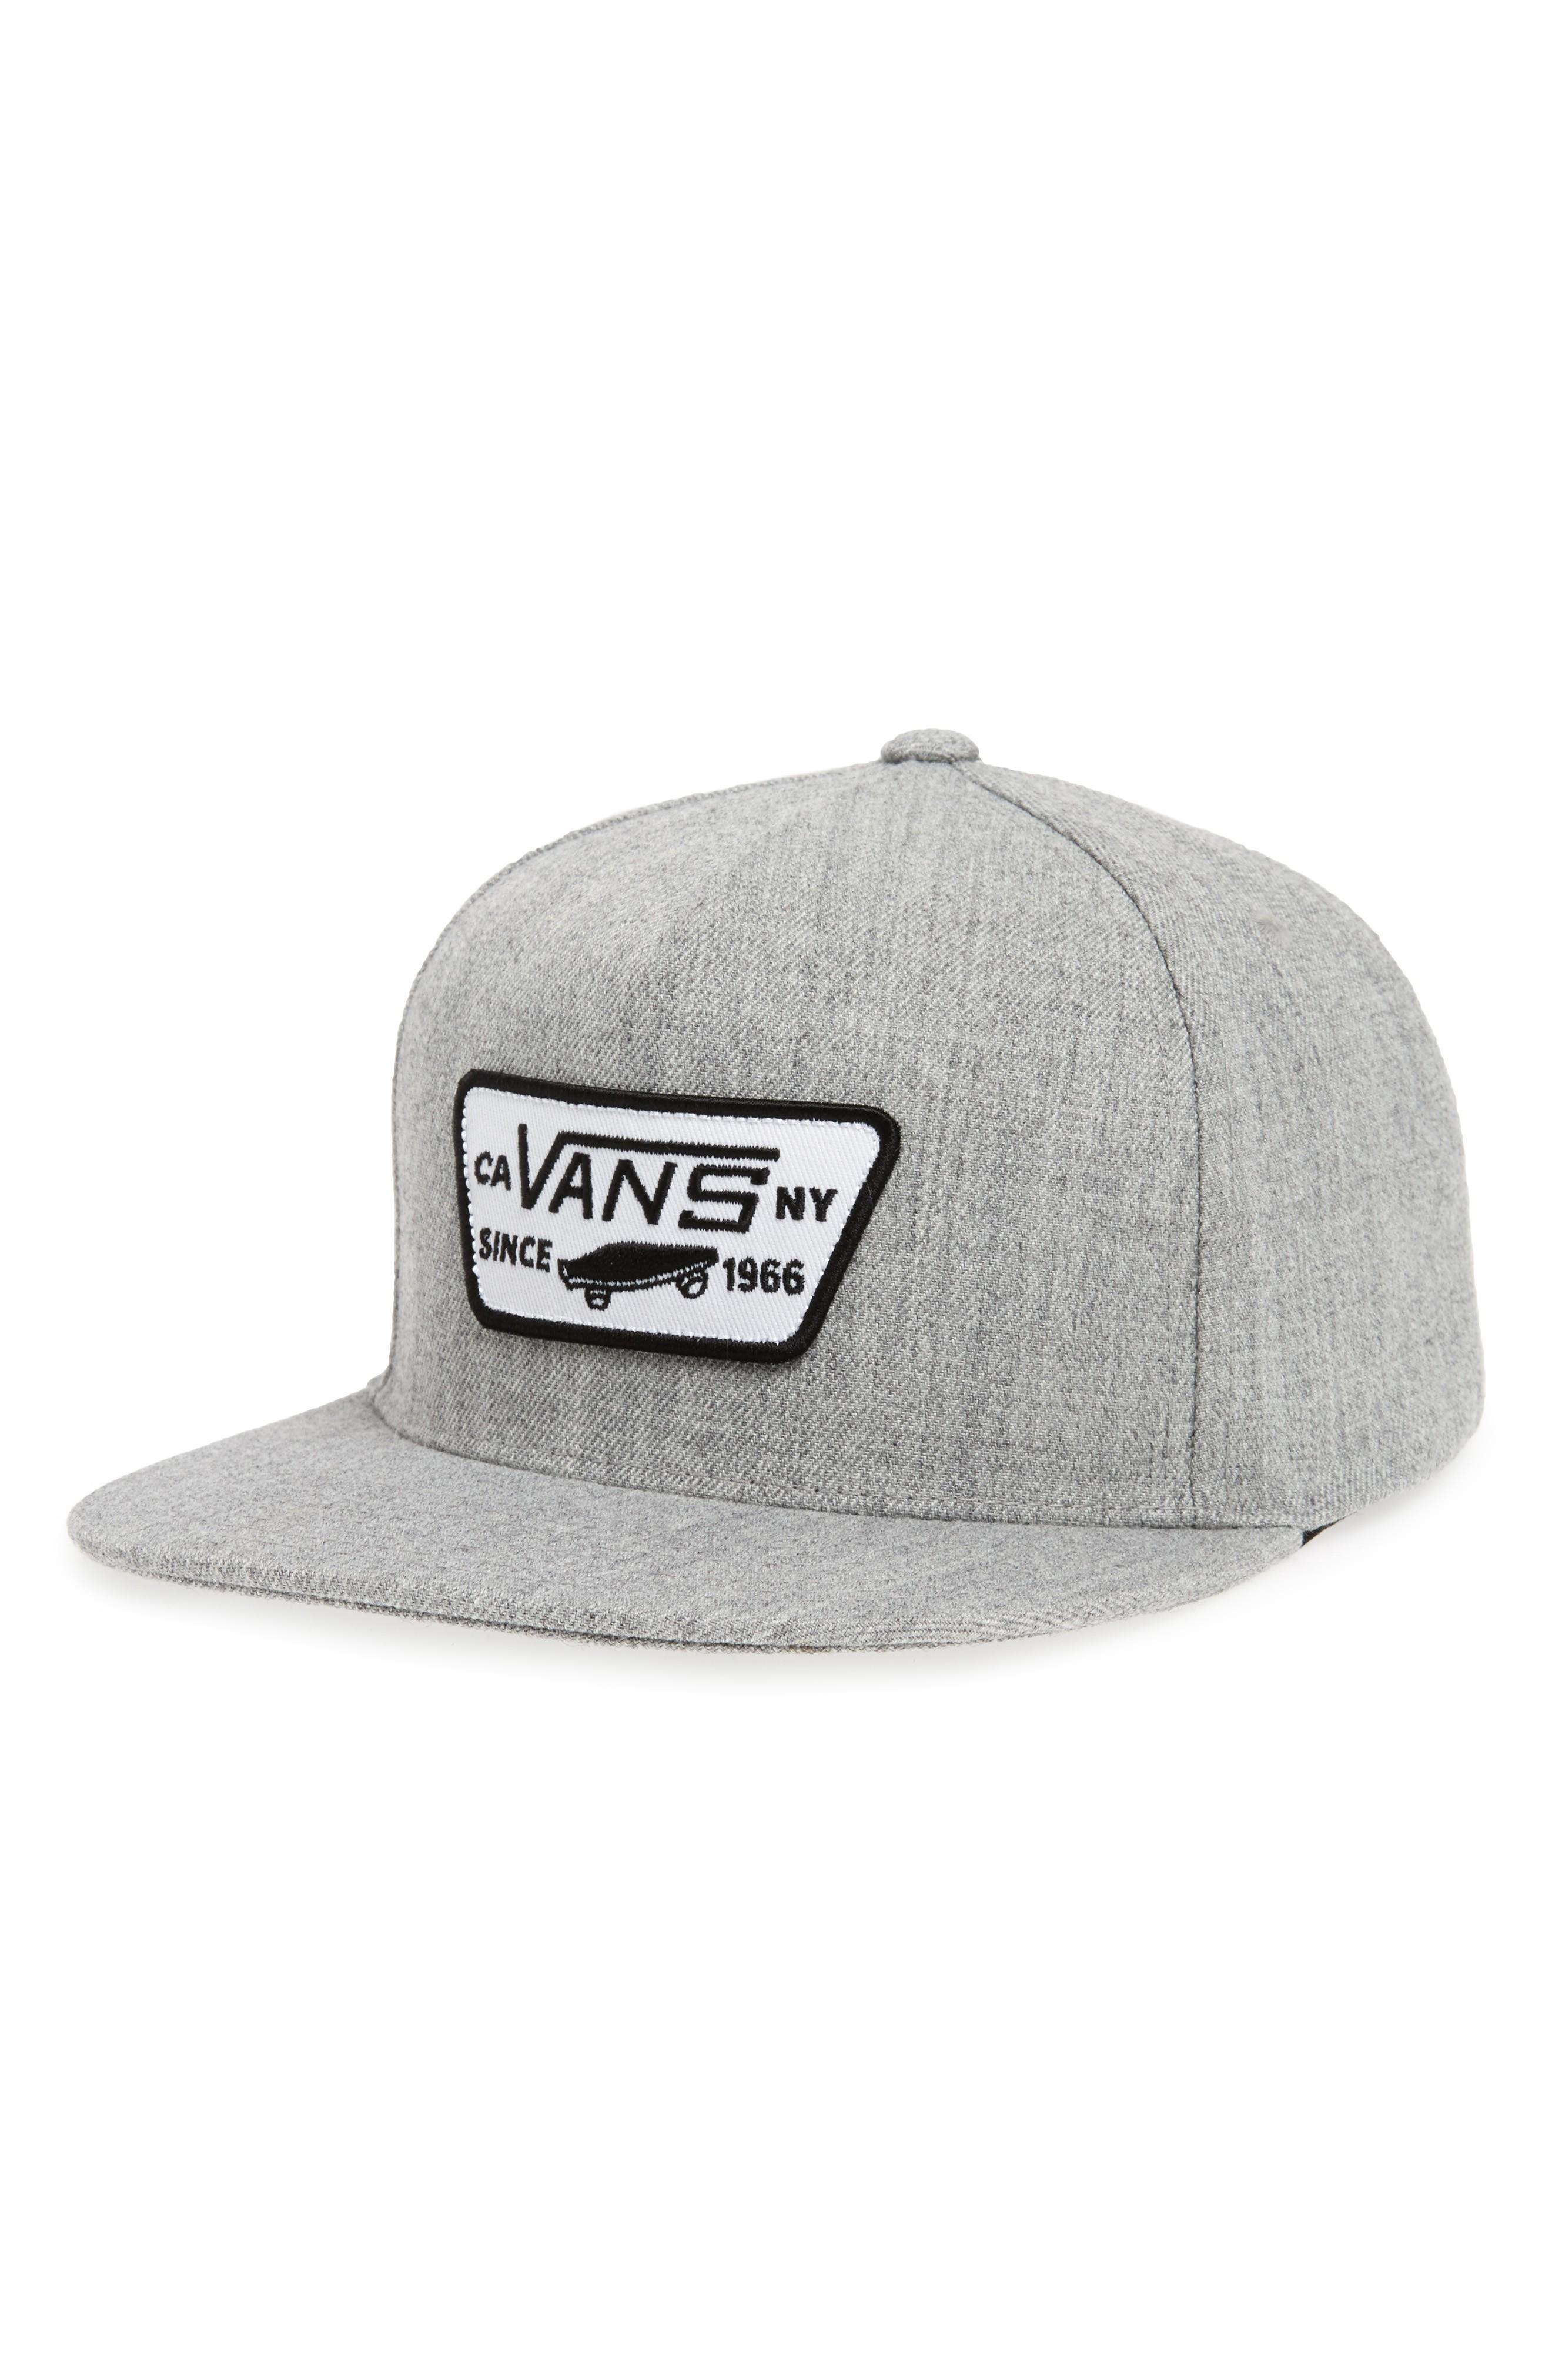 08fa2261 Vans 'Full Patch' Snapback Hat - Grey In Heather Grey   ModeSens